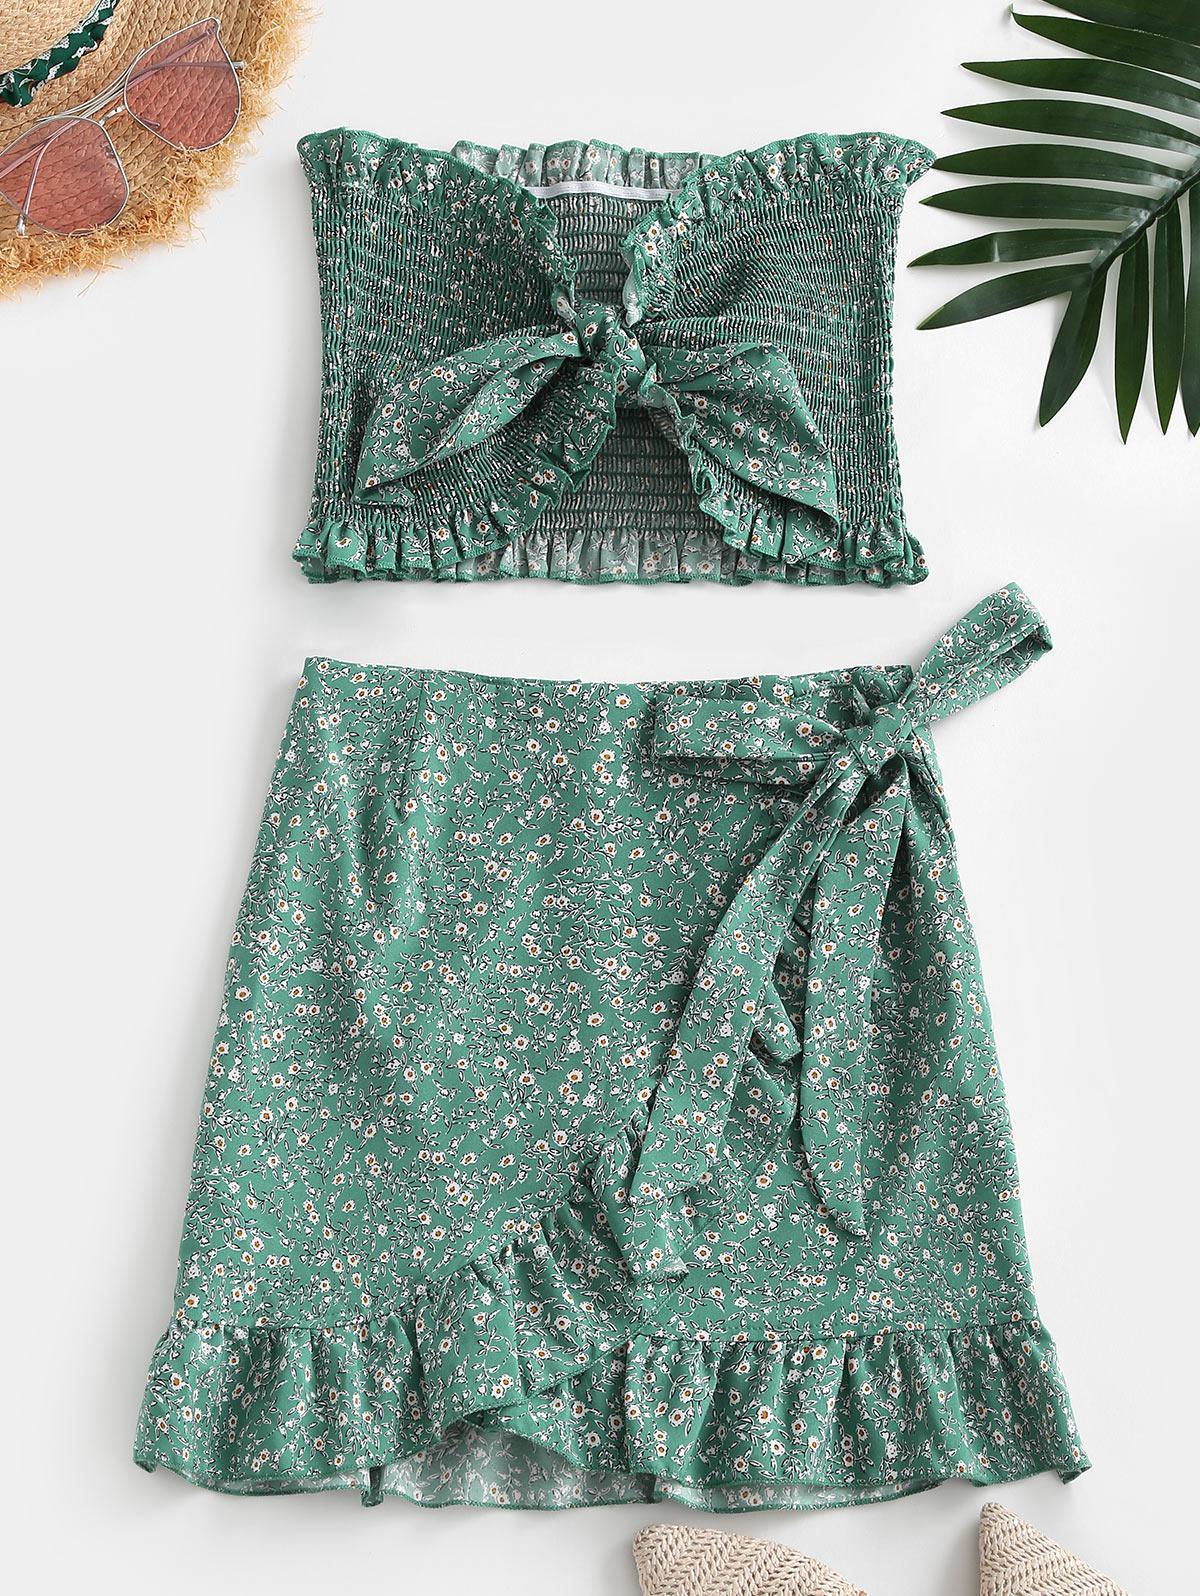 Tiny Floral Smocked Ruffles Skirt Set